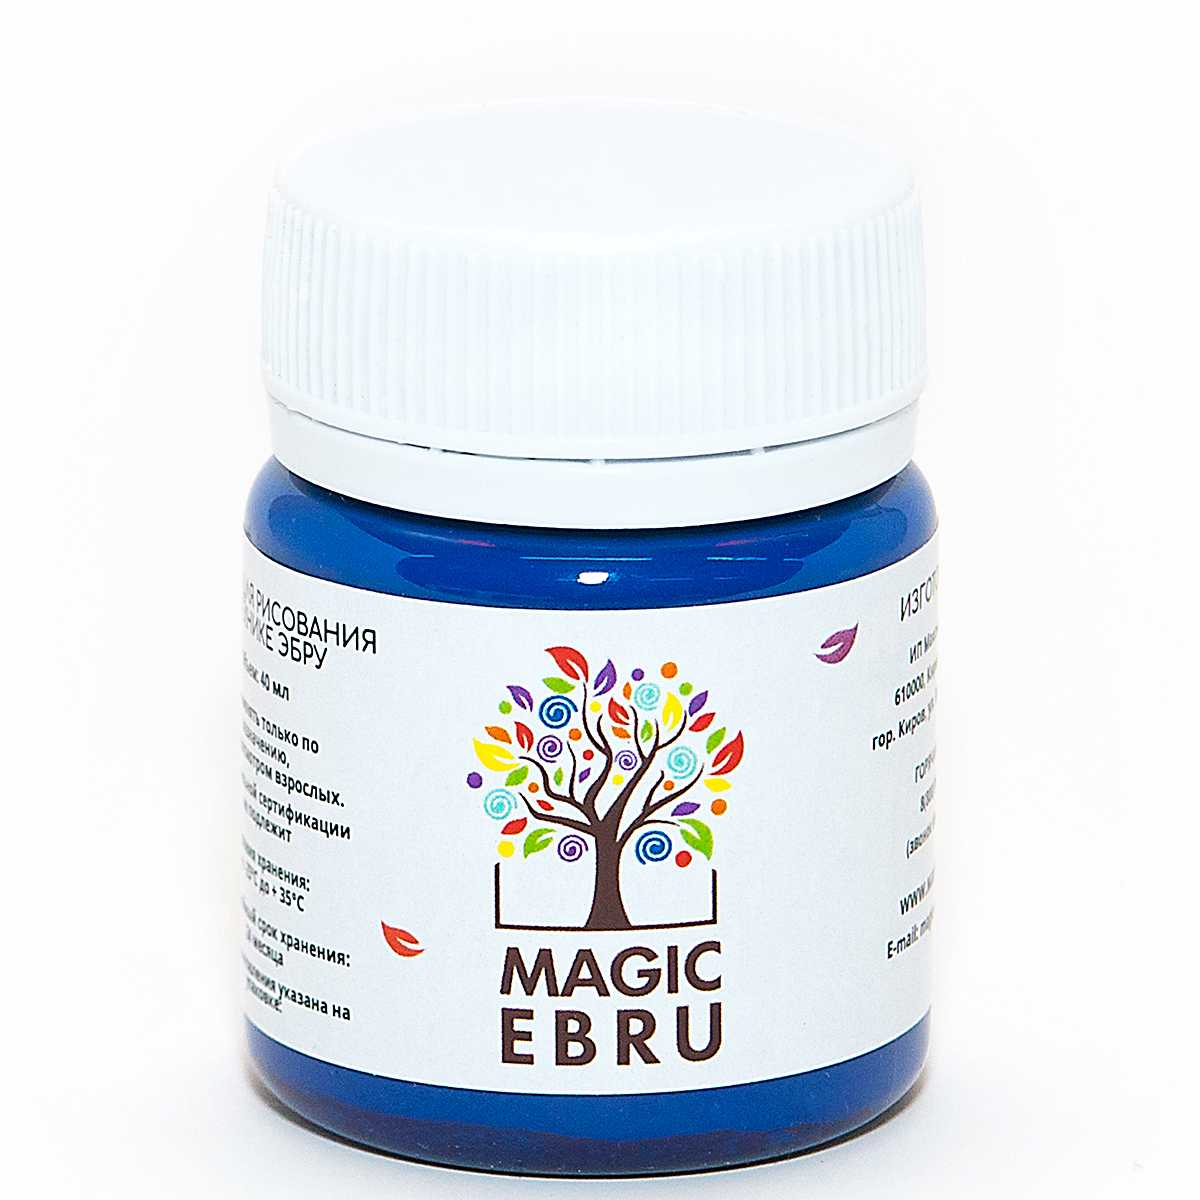 Купить Краска Magic EBRU 40 мл, синяя, Россия